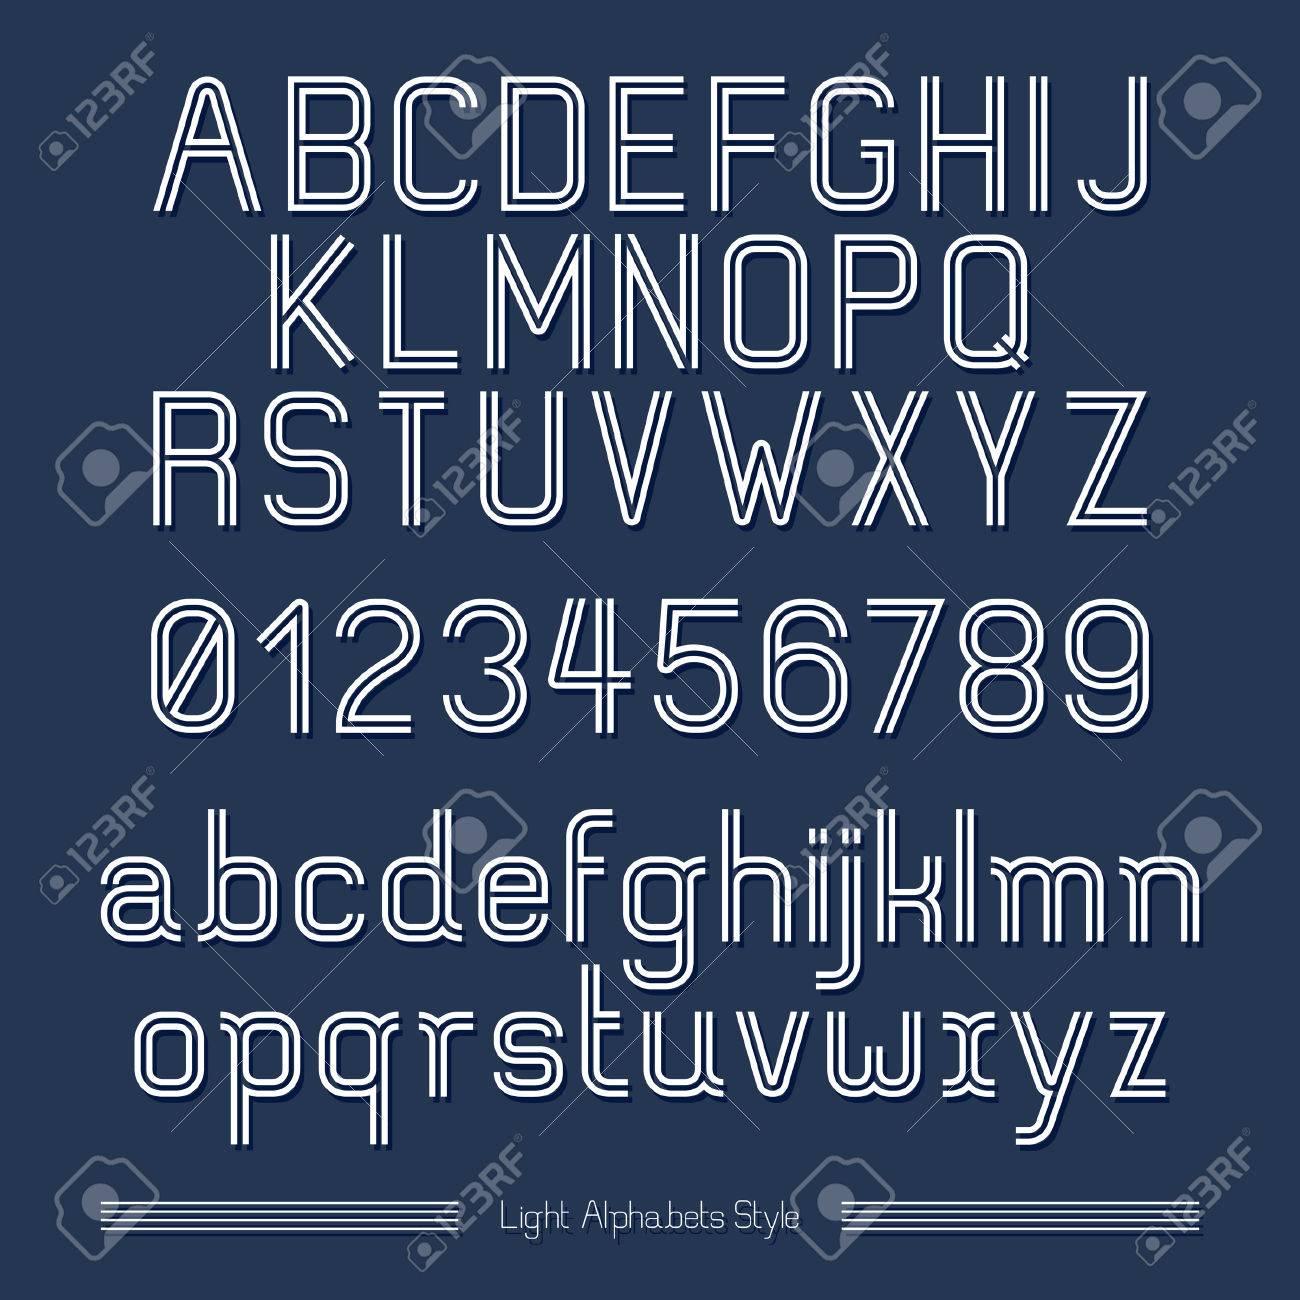 Alphabet Line stripes style on blue background. Vector illustration. Stock Vector - 22958017